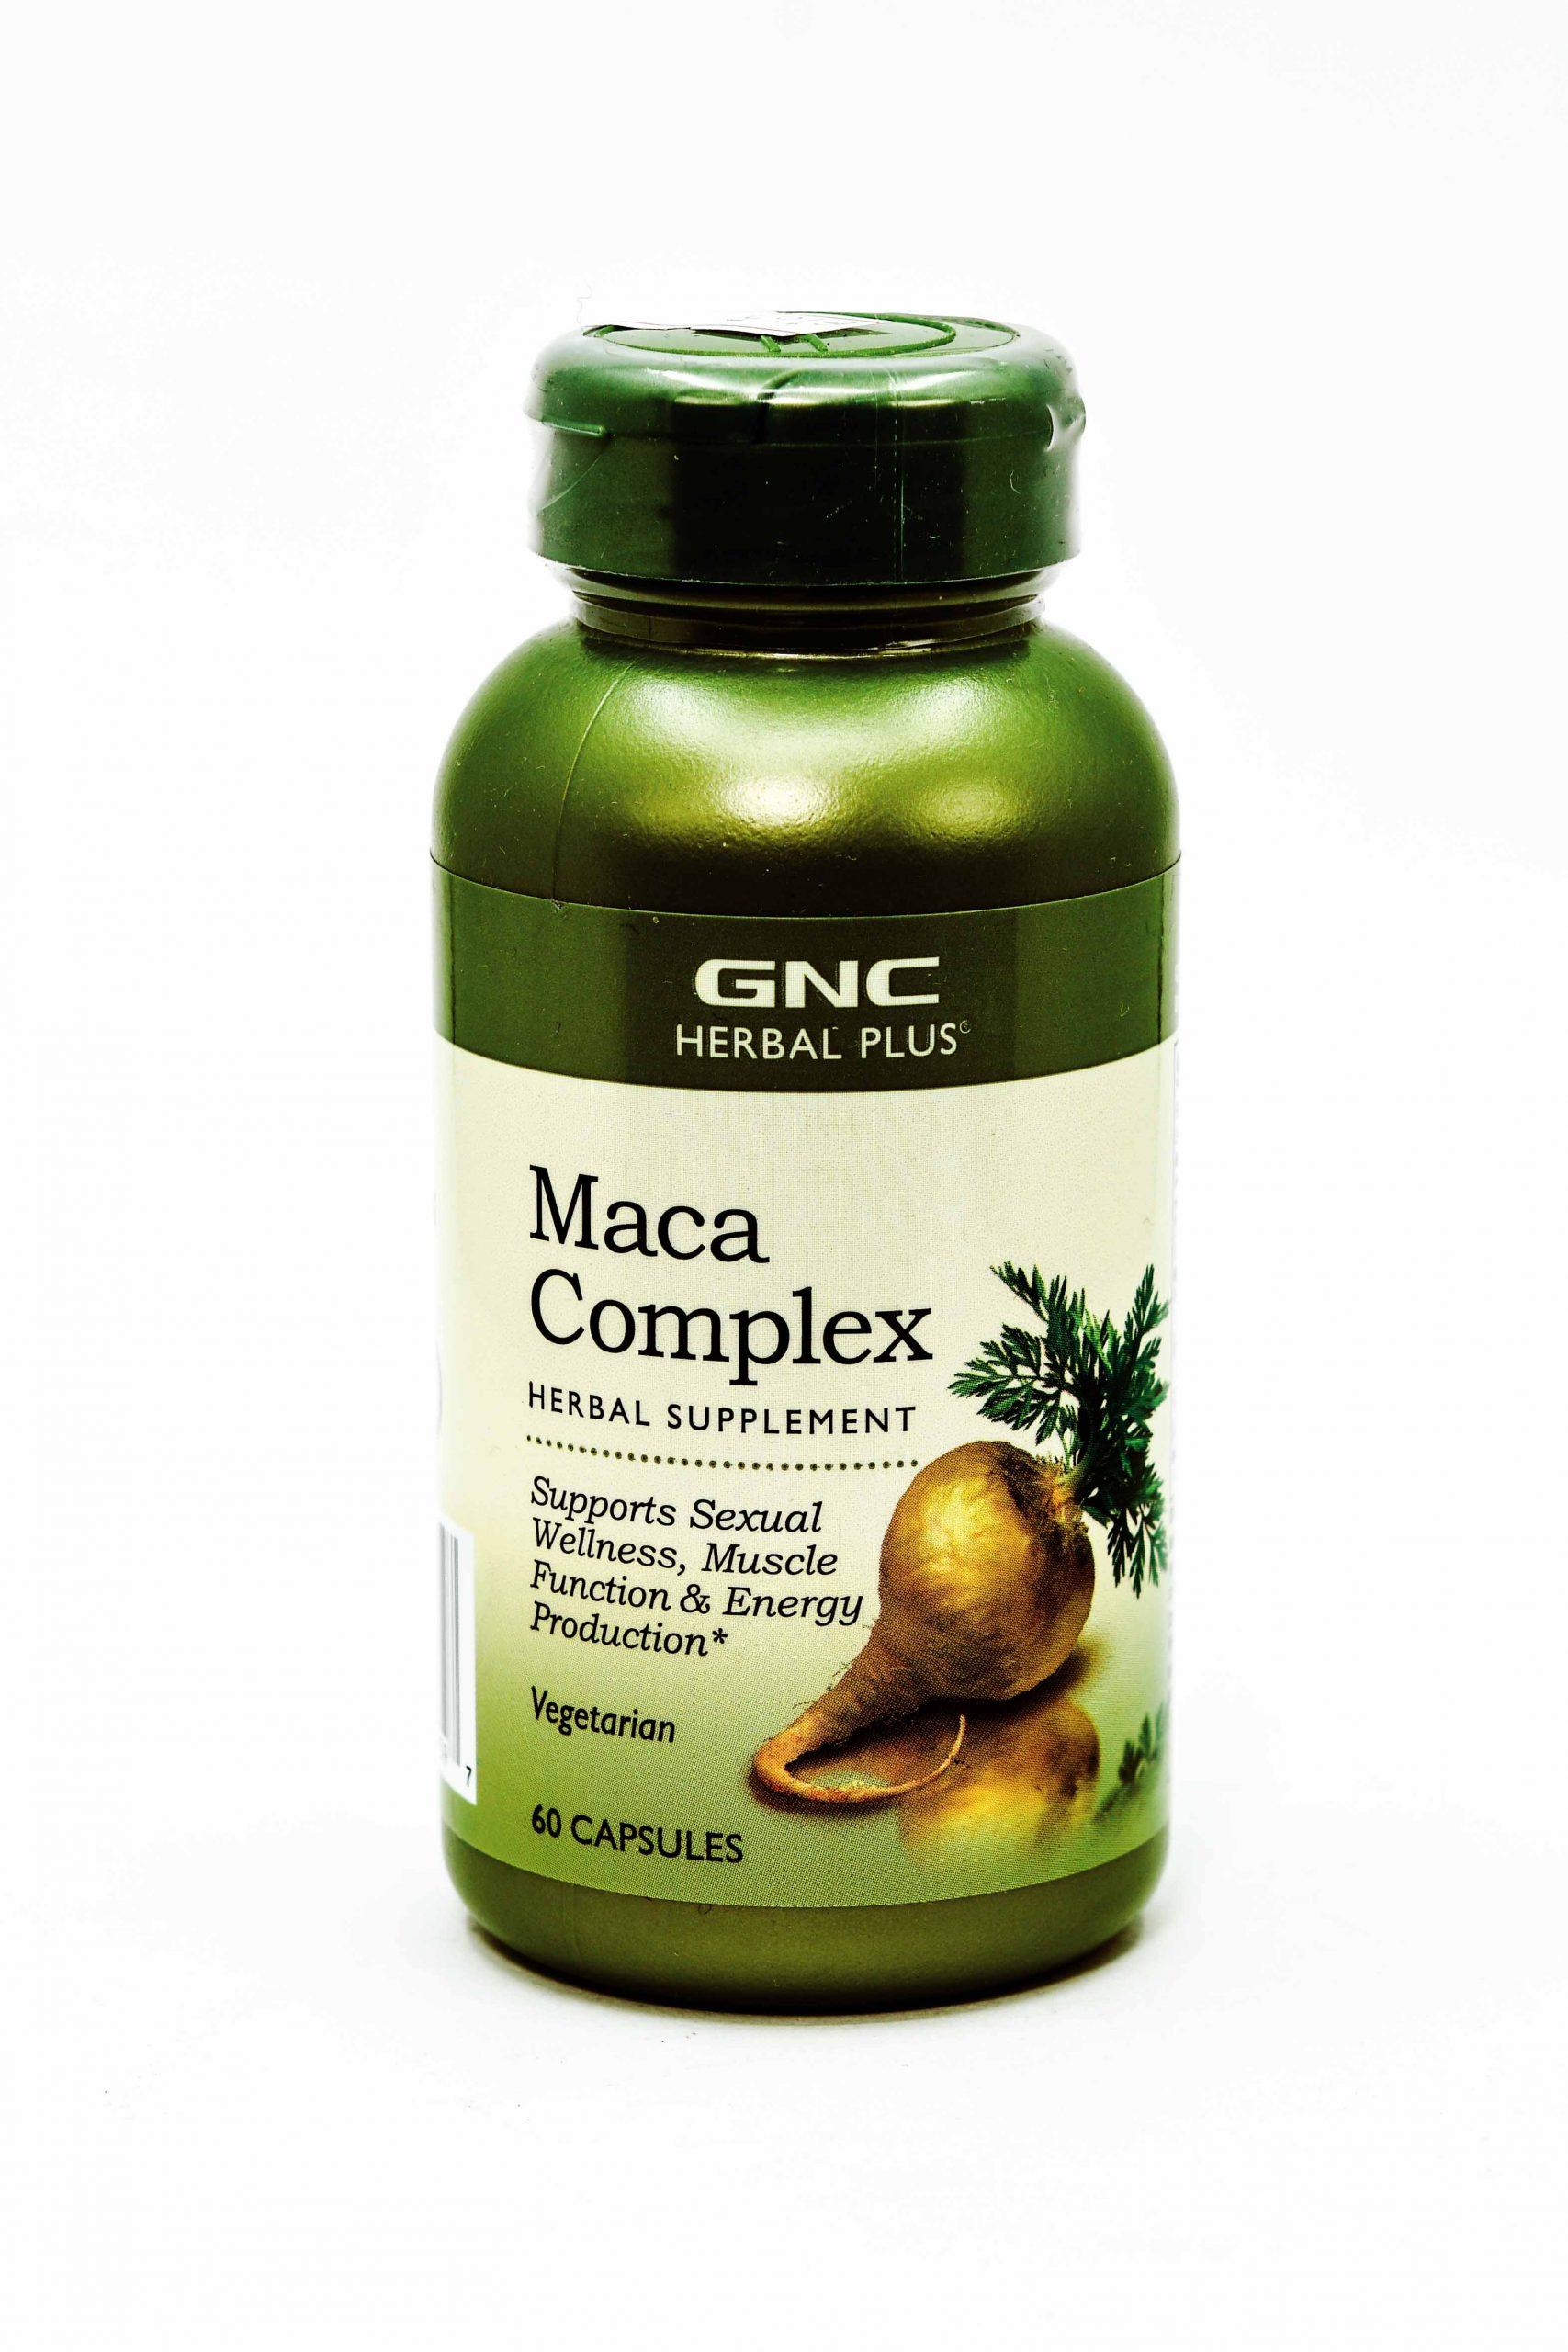 Maca Complex